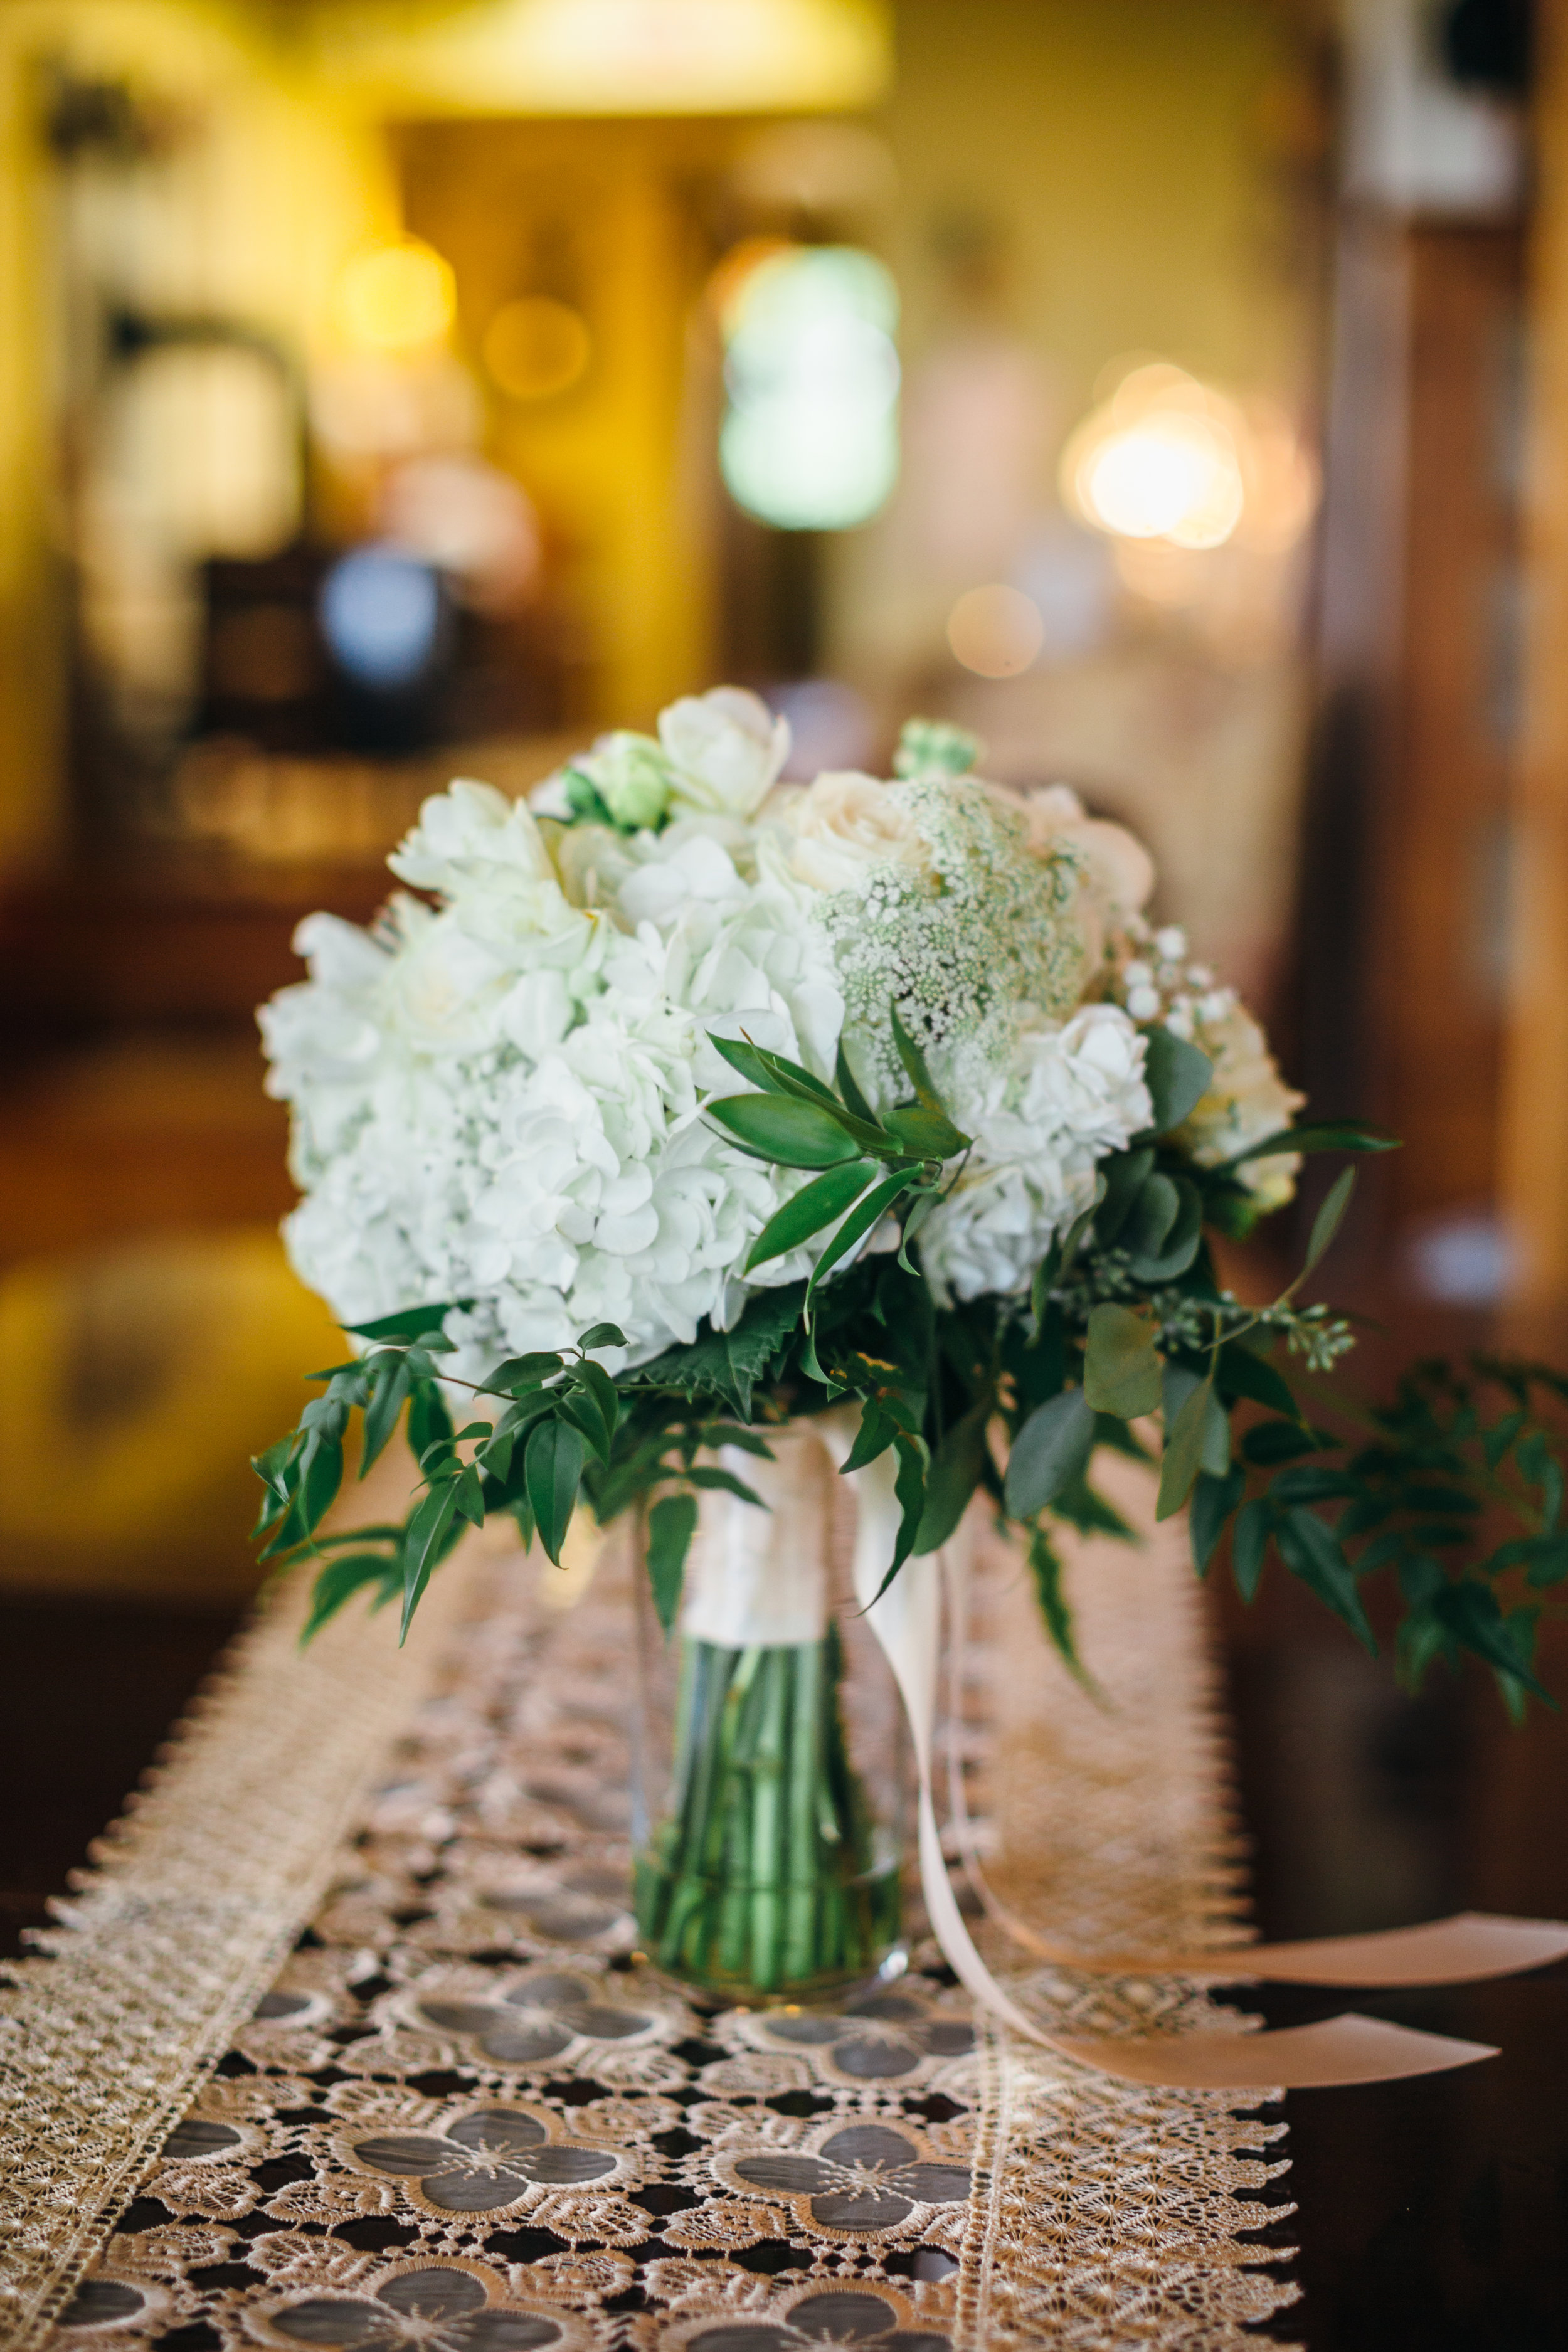 Lynchburg Wedding Photographer; Lynchburg Photographer; Lynchburg Wedding; Sorella Farms Wedding; Virginia Wedding Photographer; Virginia Wedding-34.jpg